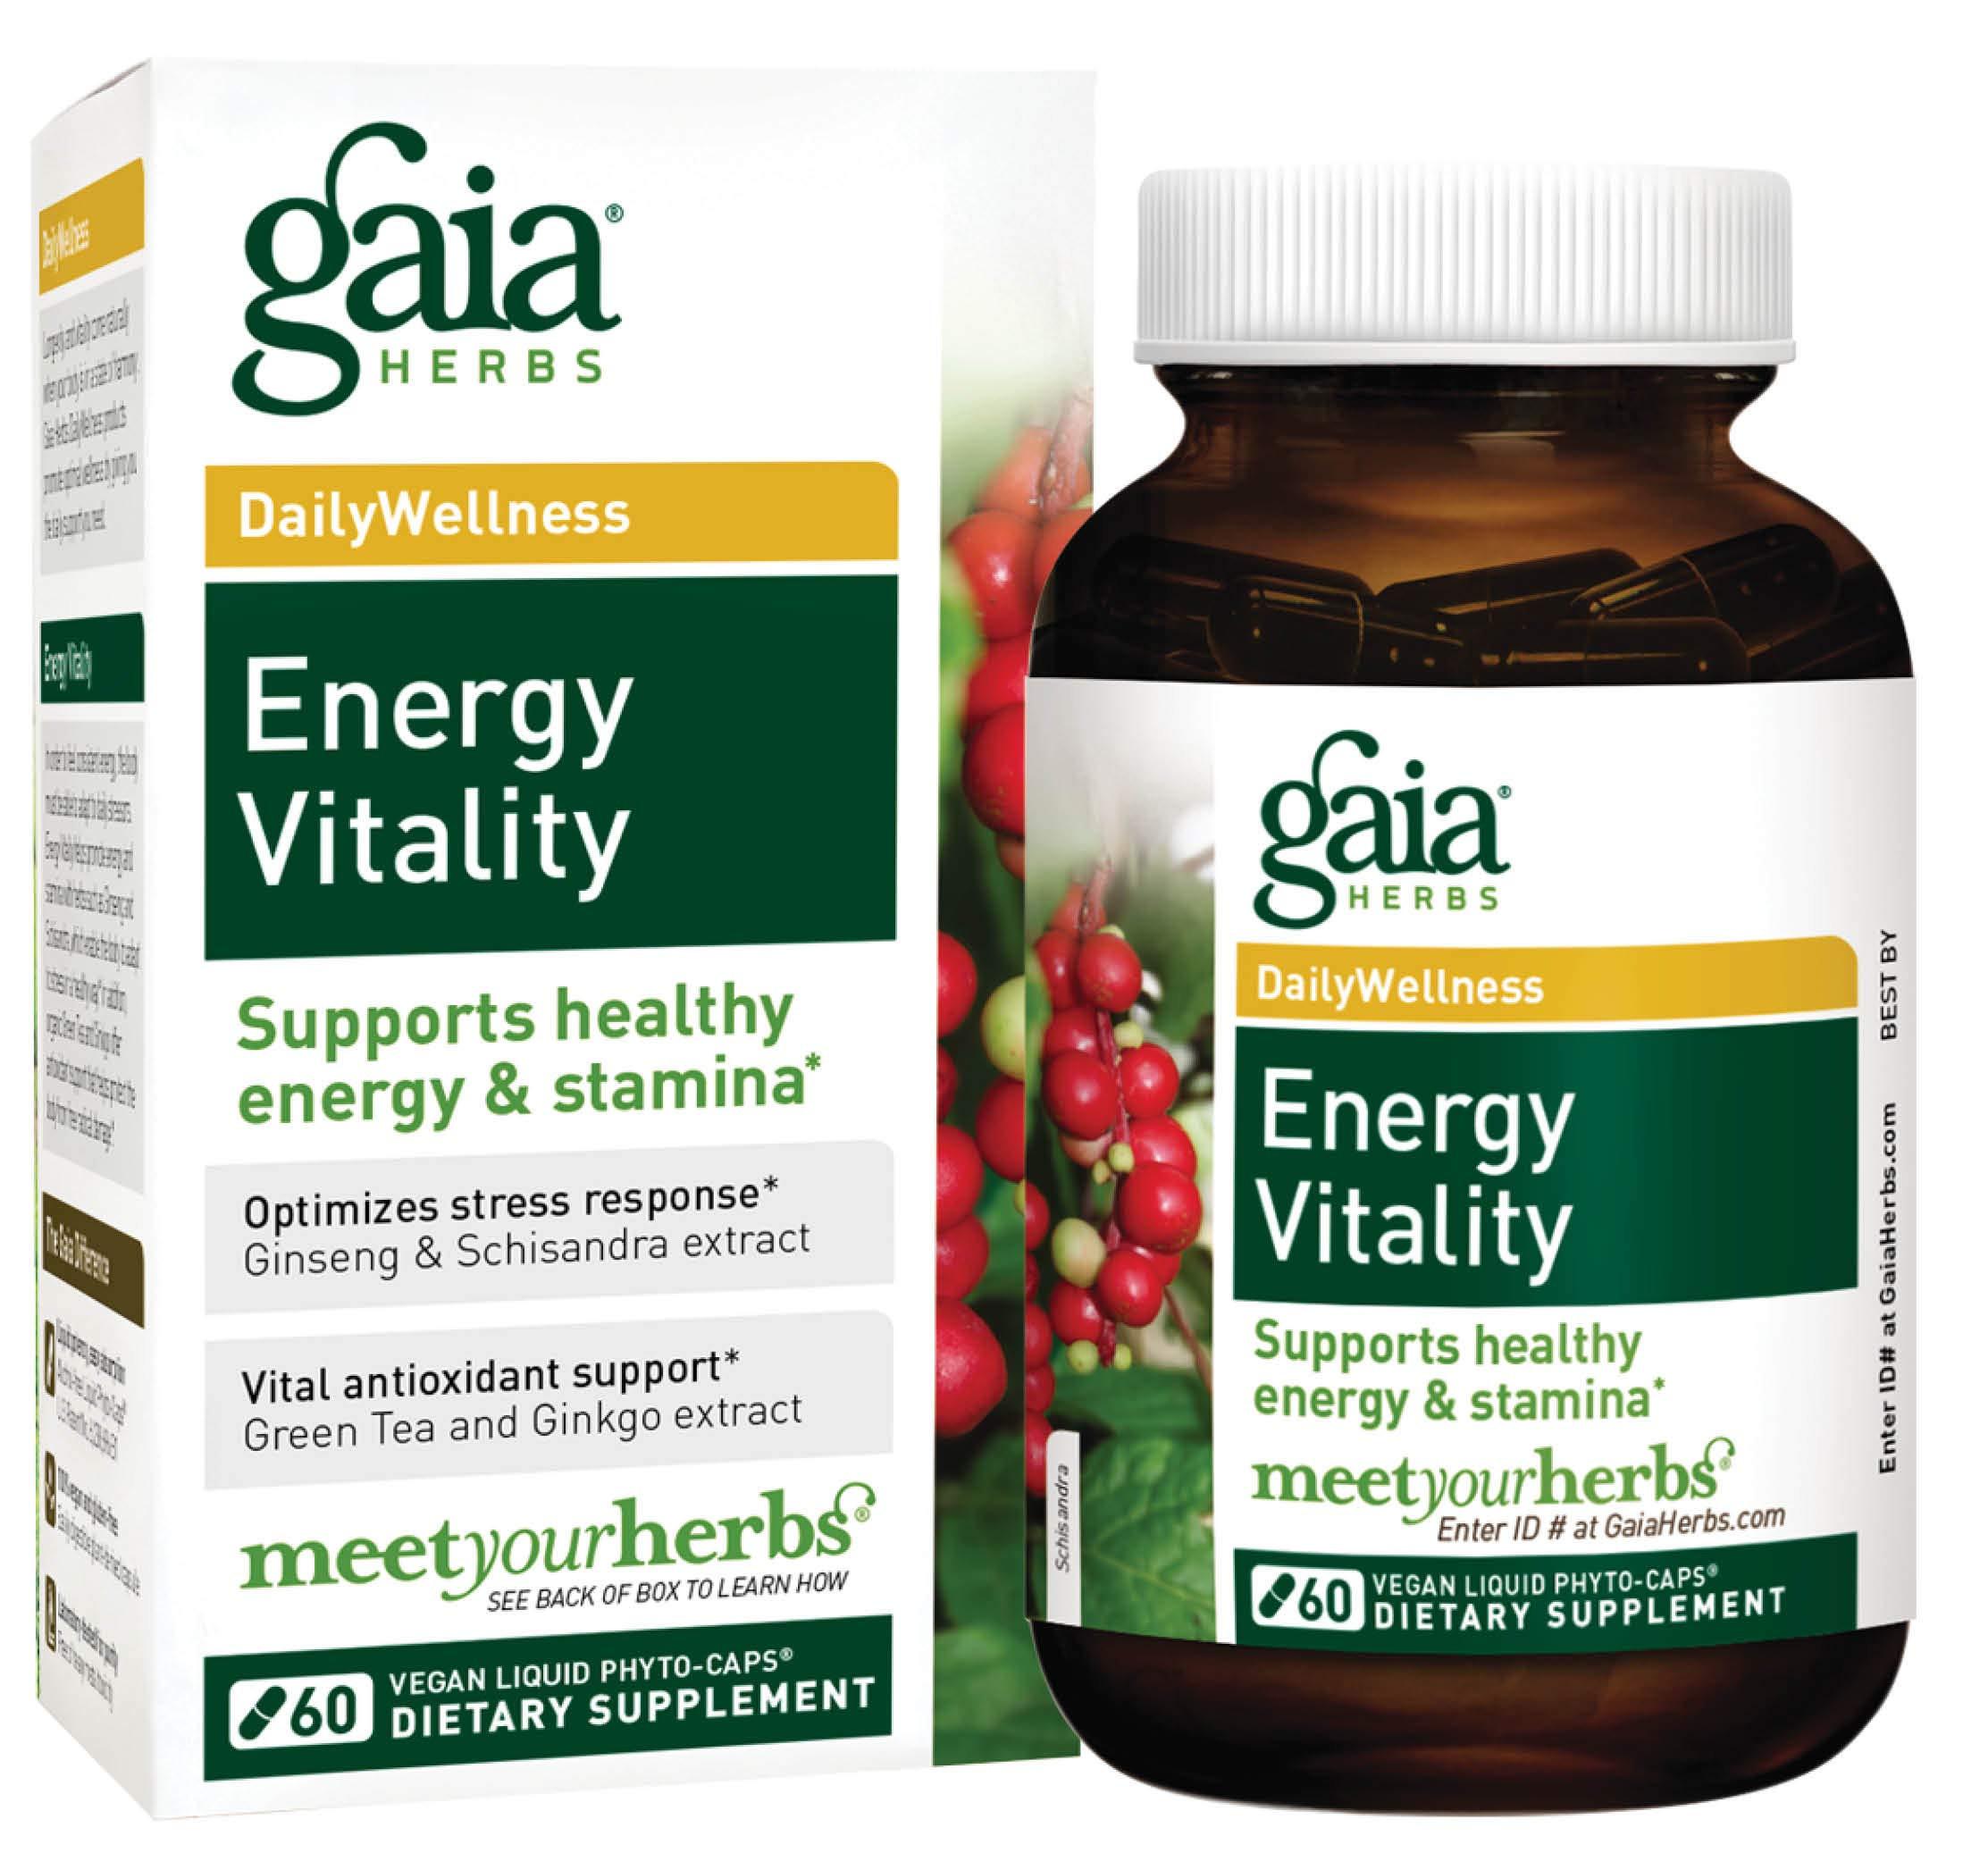 Gaia Herbs Energy Vitality Vegan Liquid Capsules 60 Count Promotes Healthy Energy and